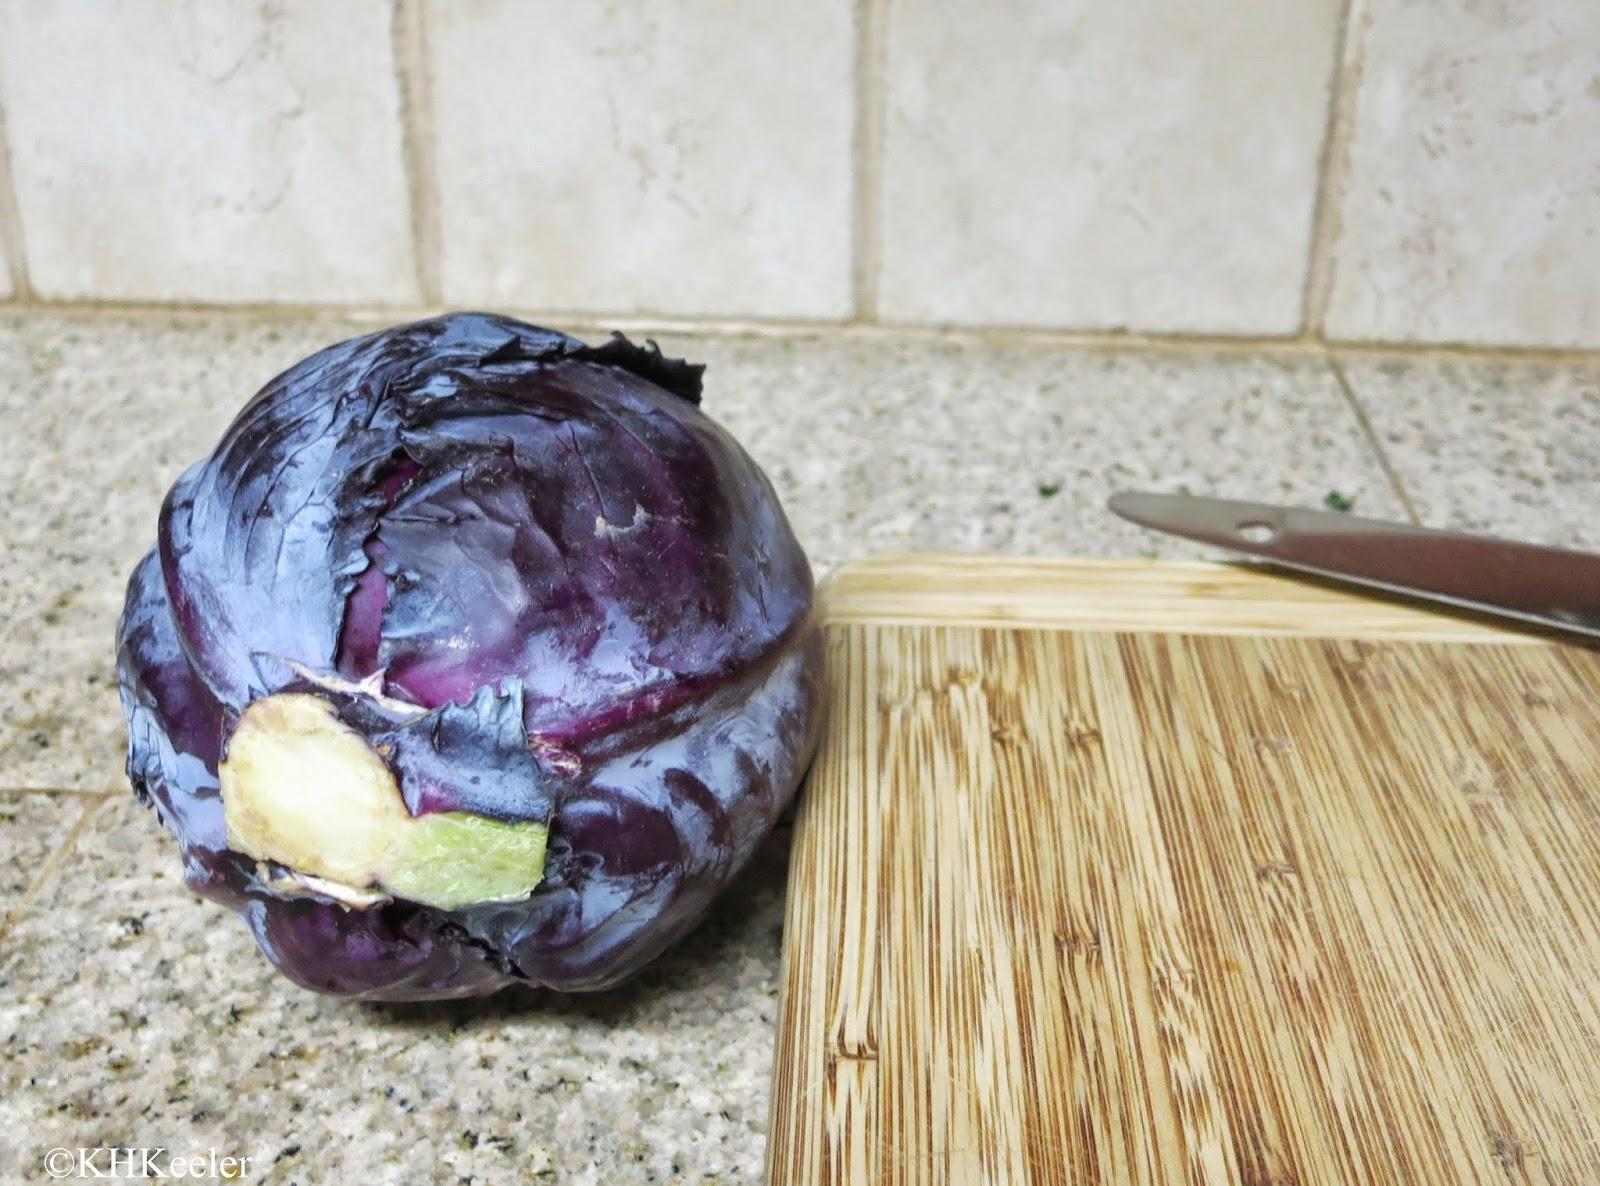 Dyestuff: 1 red cabbage, Brassica oleracea